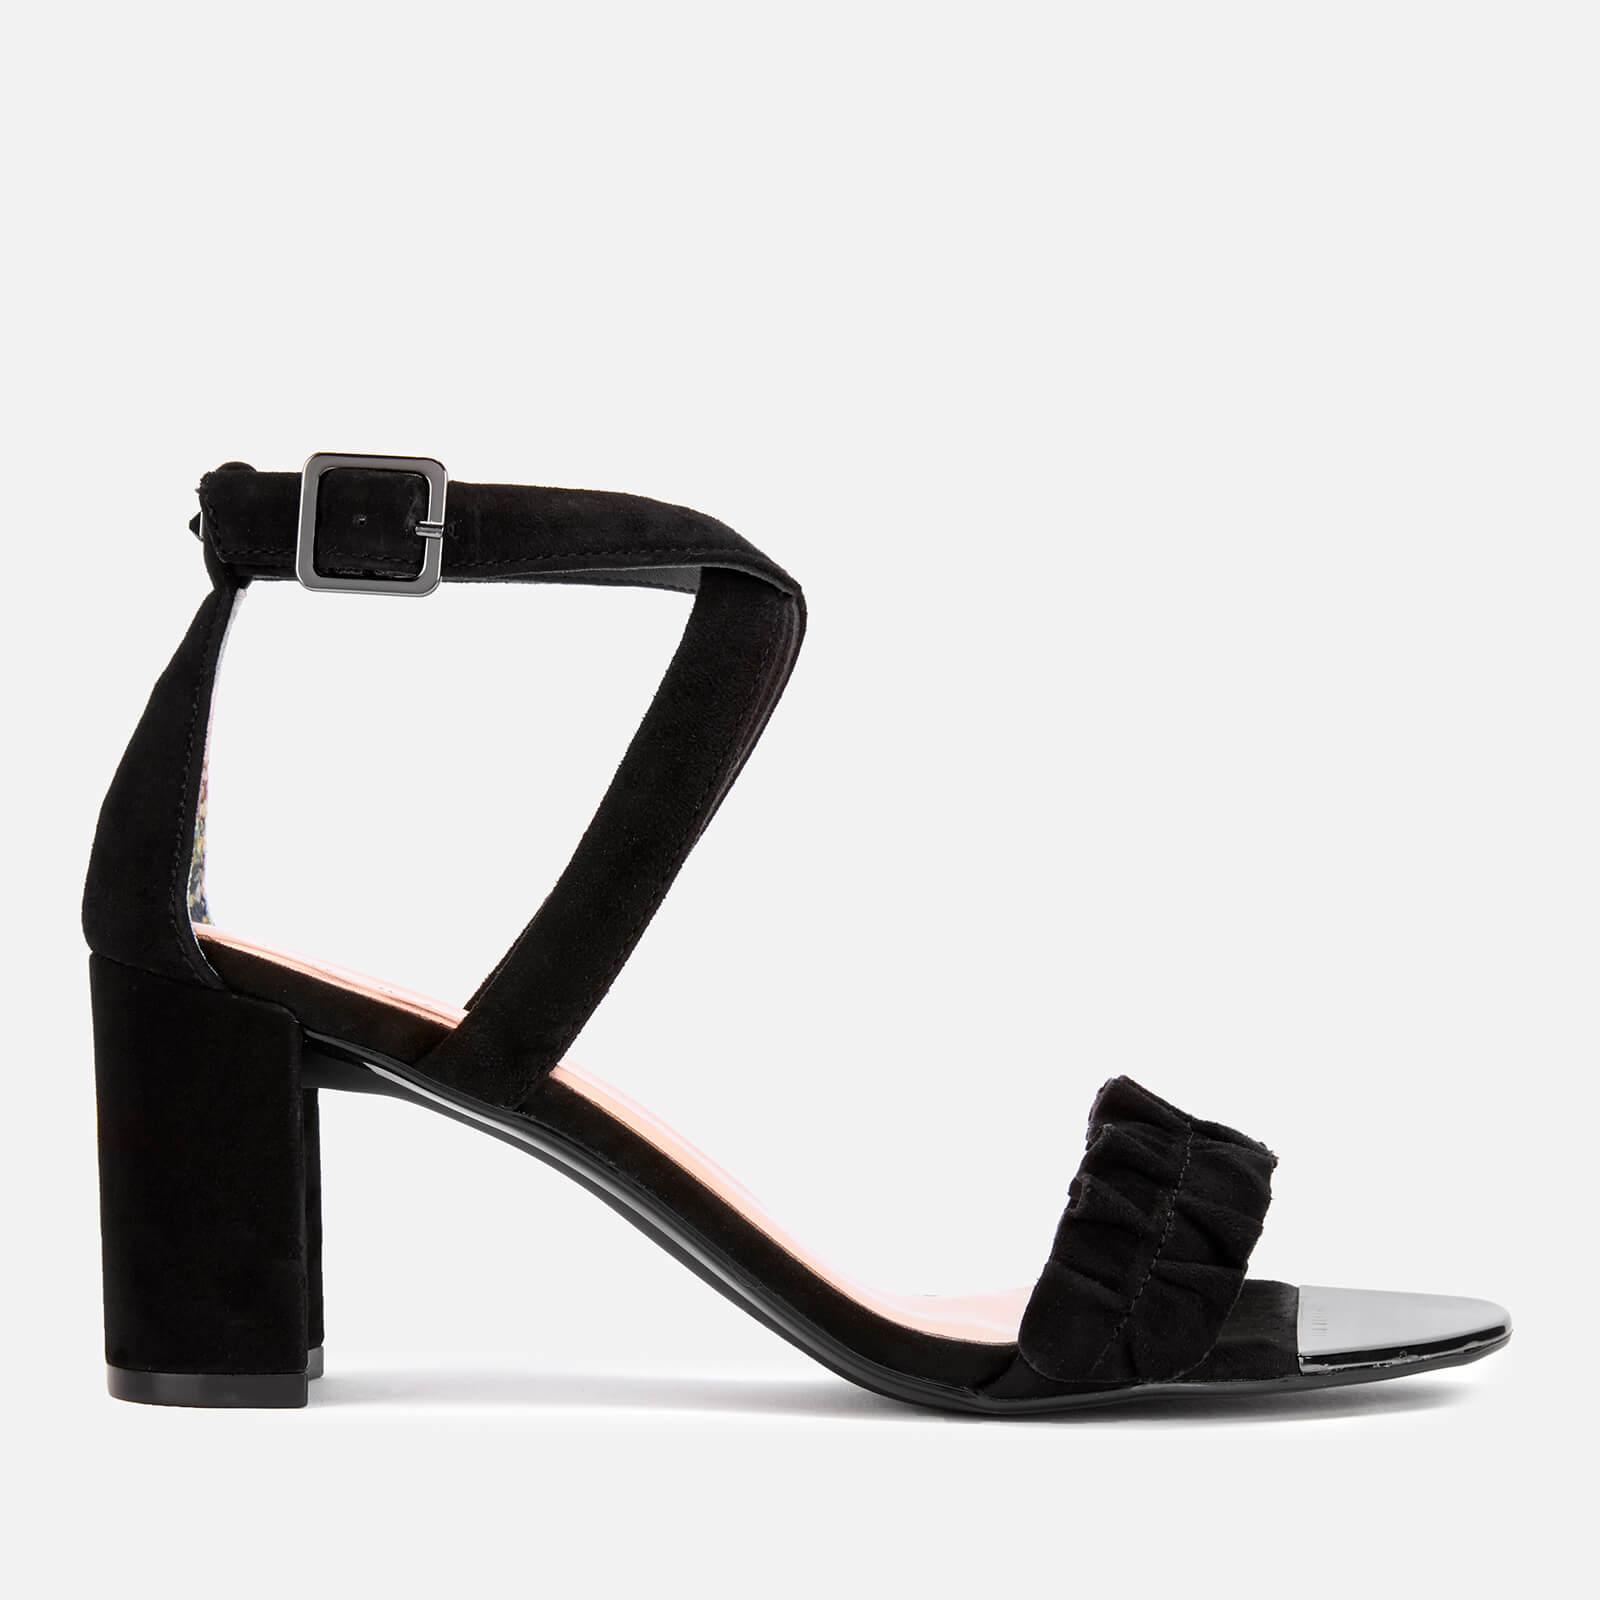 Ted Baker Women's Floxen Suede Block Heeled Sandals - Black - UK 7 - Black